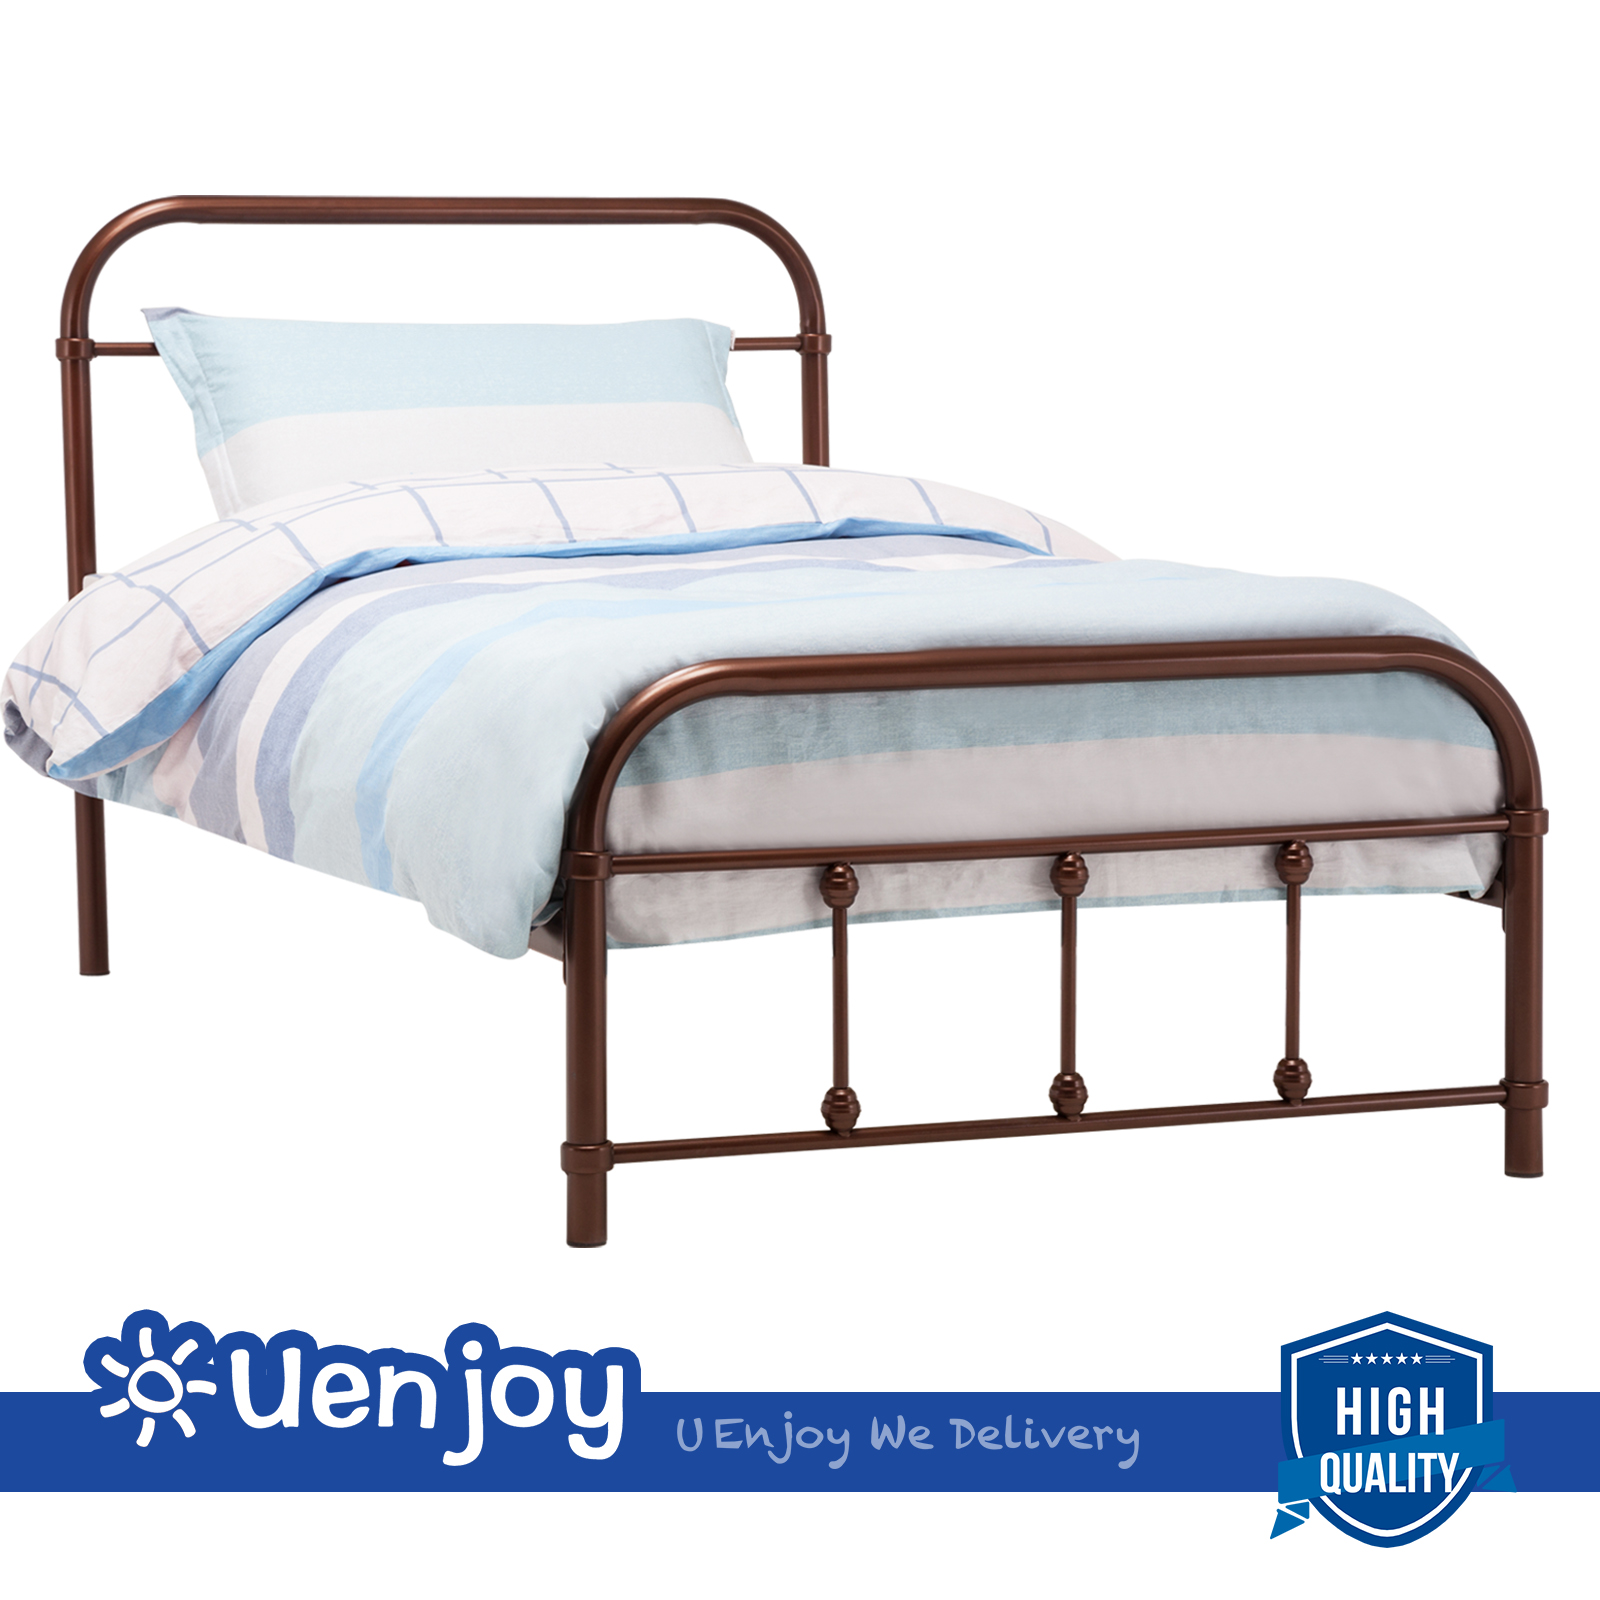 Metal bed frame platform twin full queen size w headboard for Queen footboard